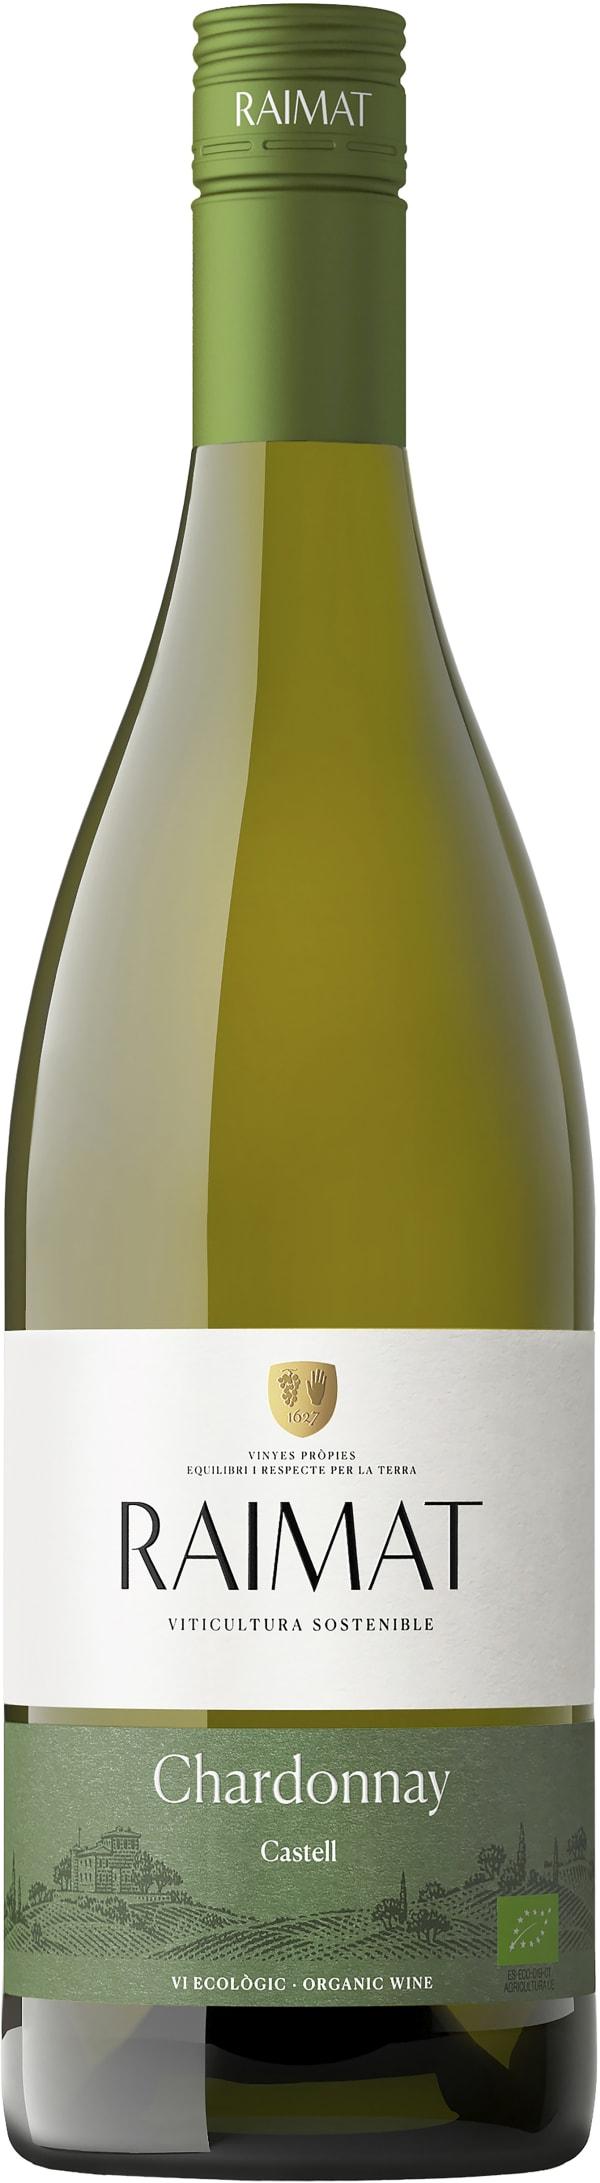 Raimat Castell Chardonnay 2017